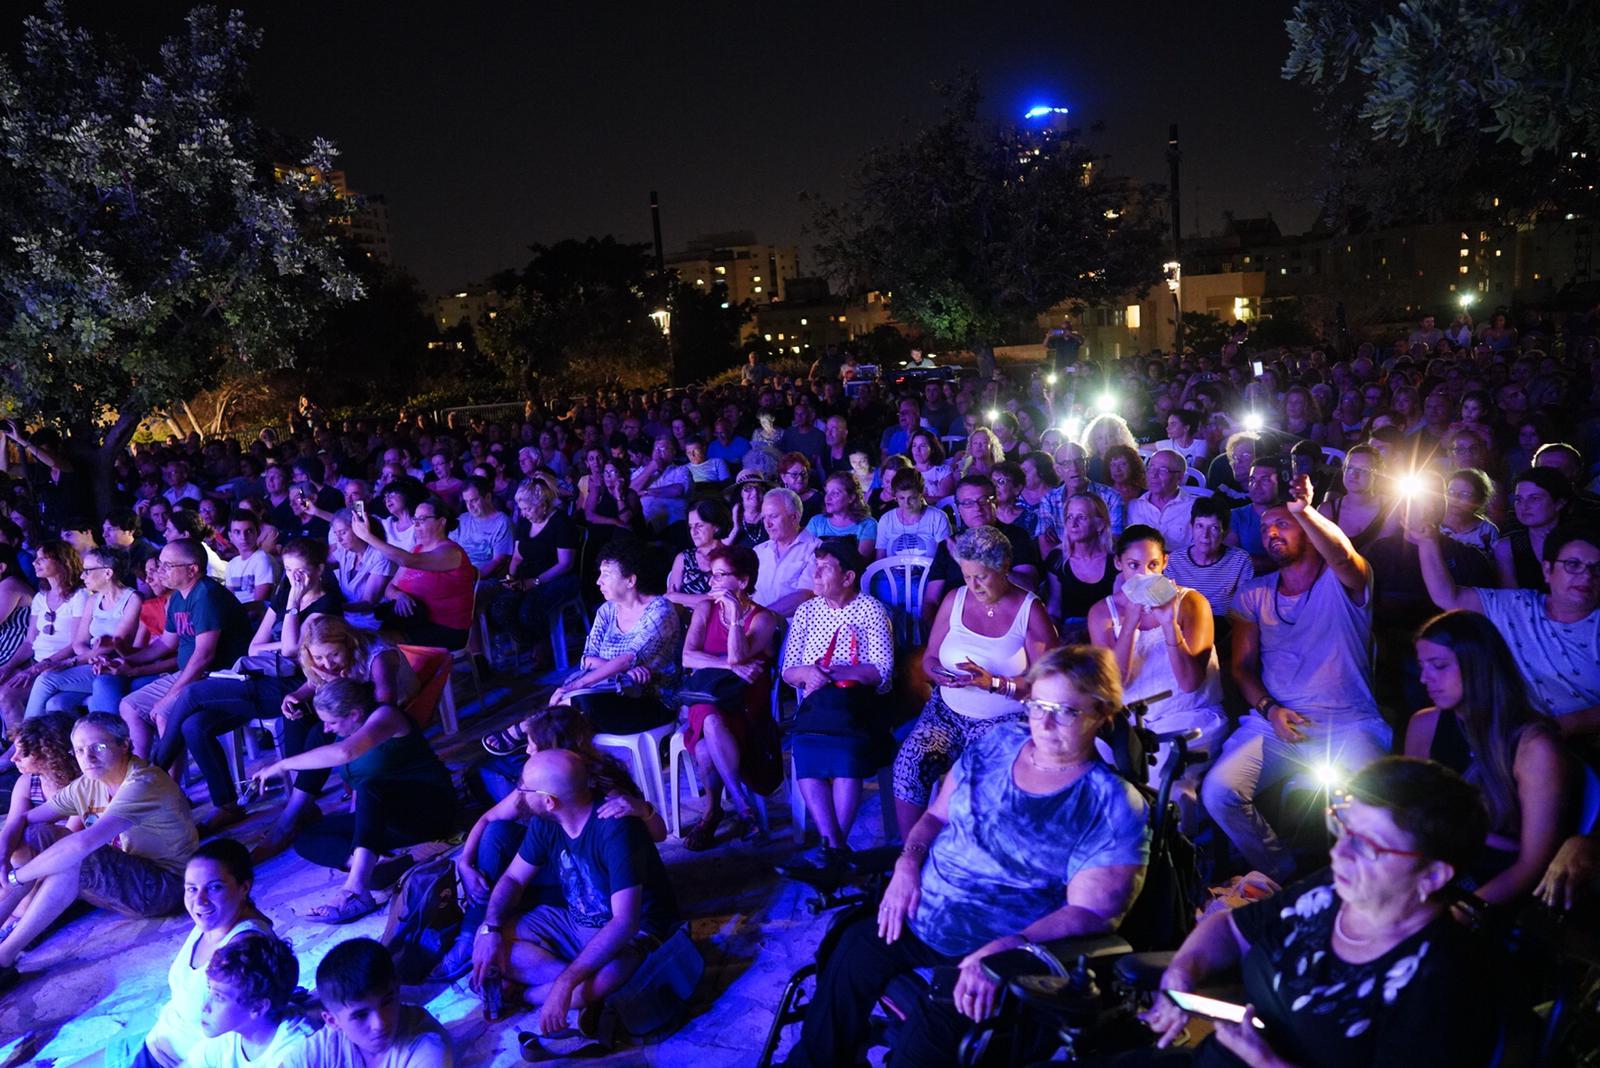 Photo of ערב מחווה לאריק איינשטיין, שלום חנוך ומאיר אריאל ברחבת מצפה הכוכבים בגבעתיים